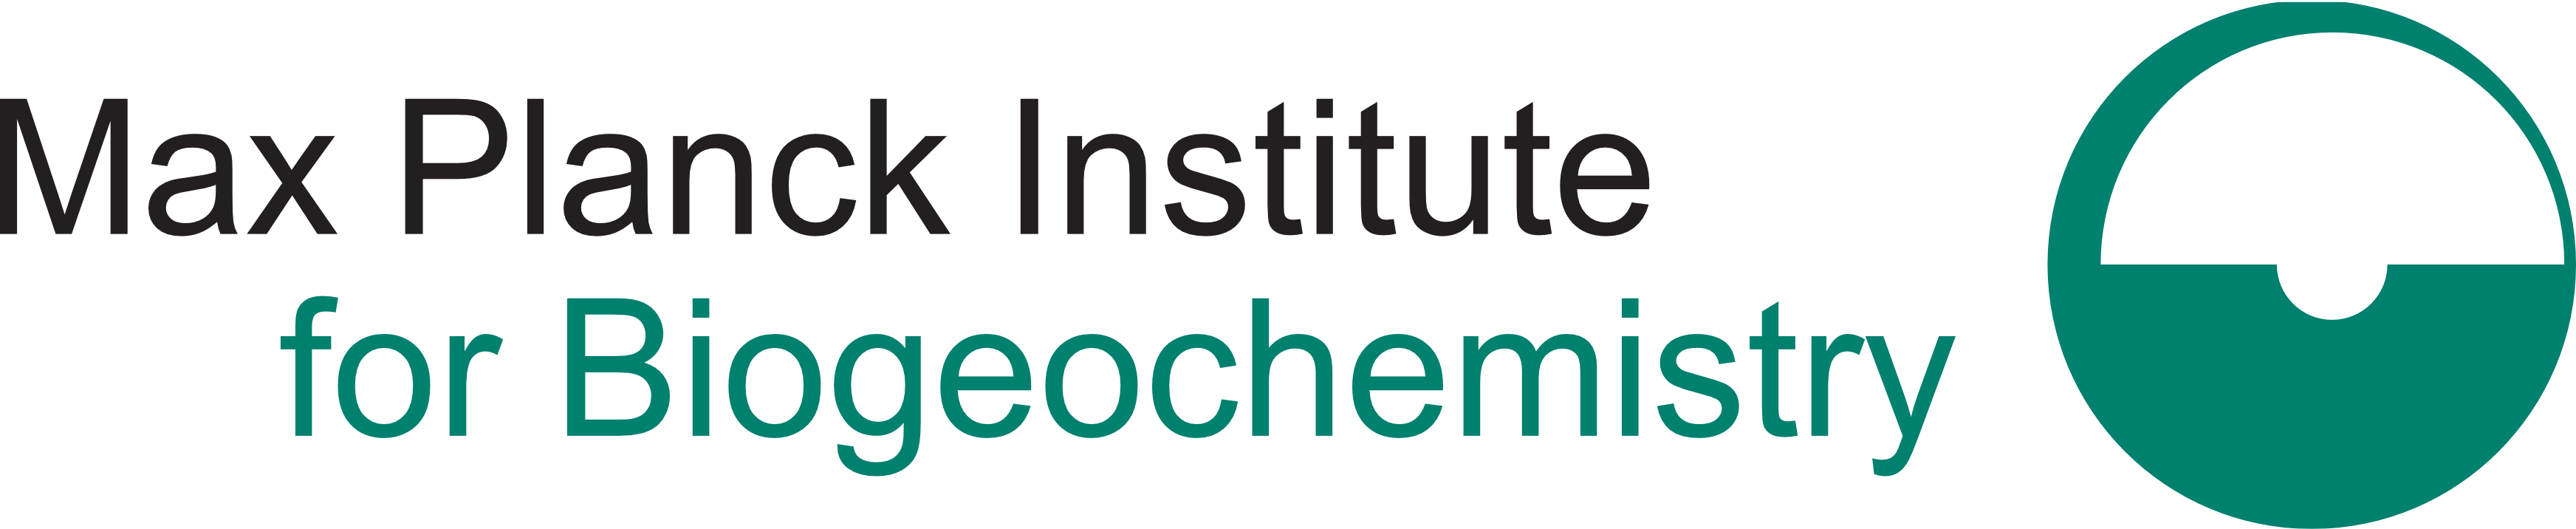 Logo Max-Planck-Institute for Biogeochemistry